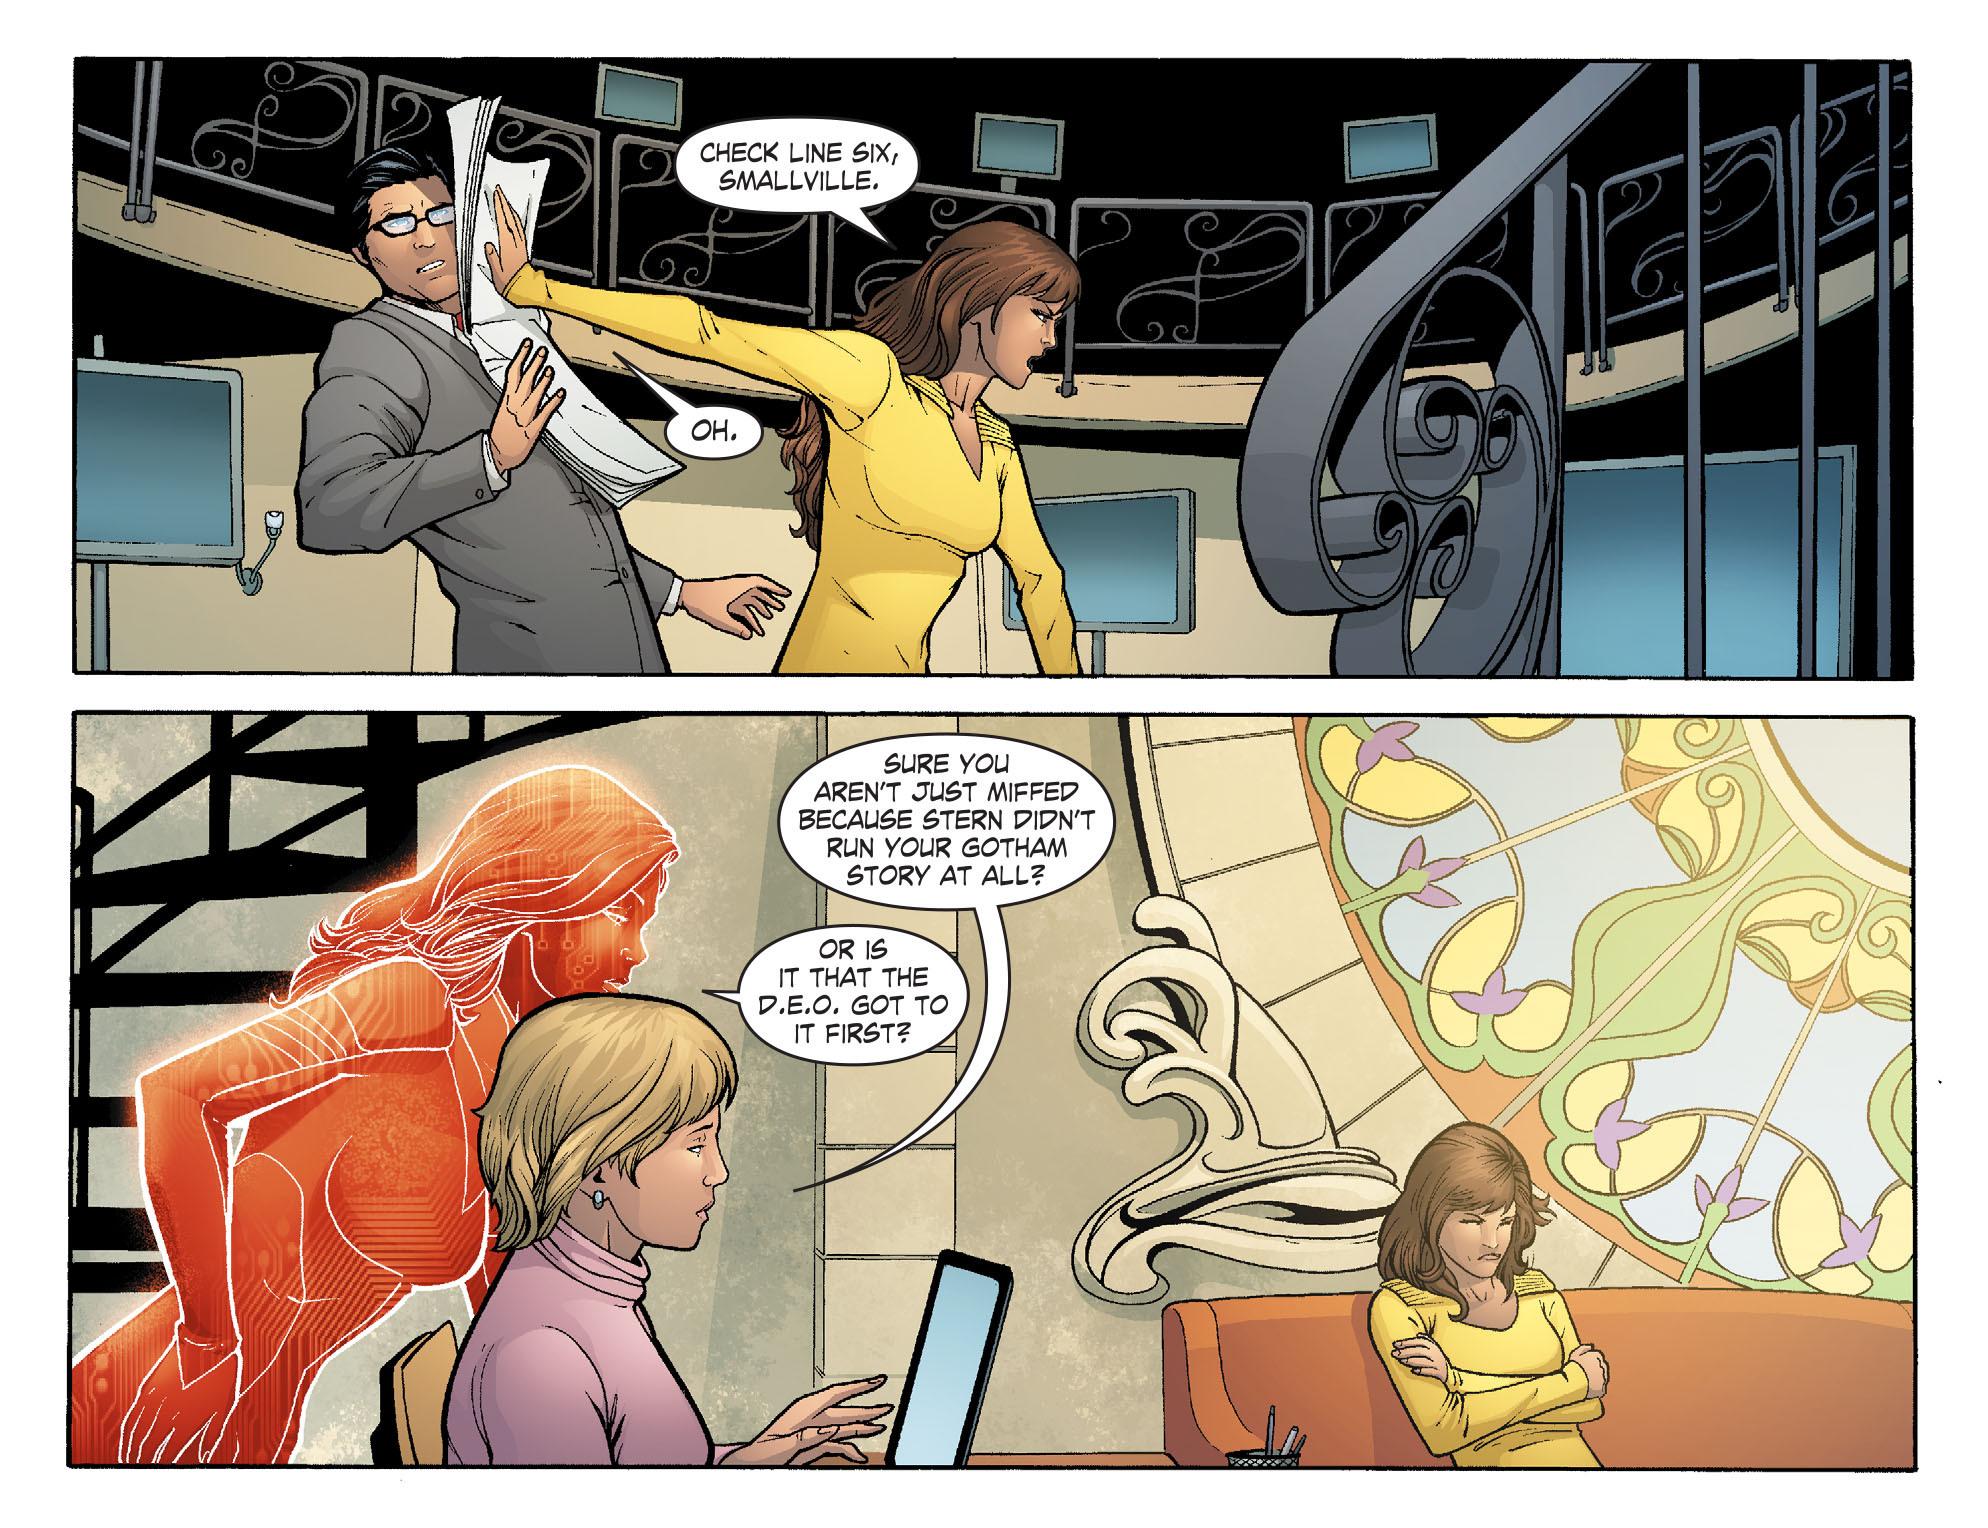 Read online Smallville: Alien comic -  Issue #12 - 10